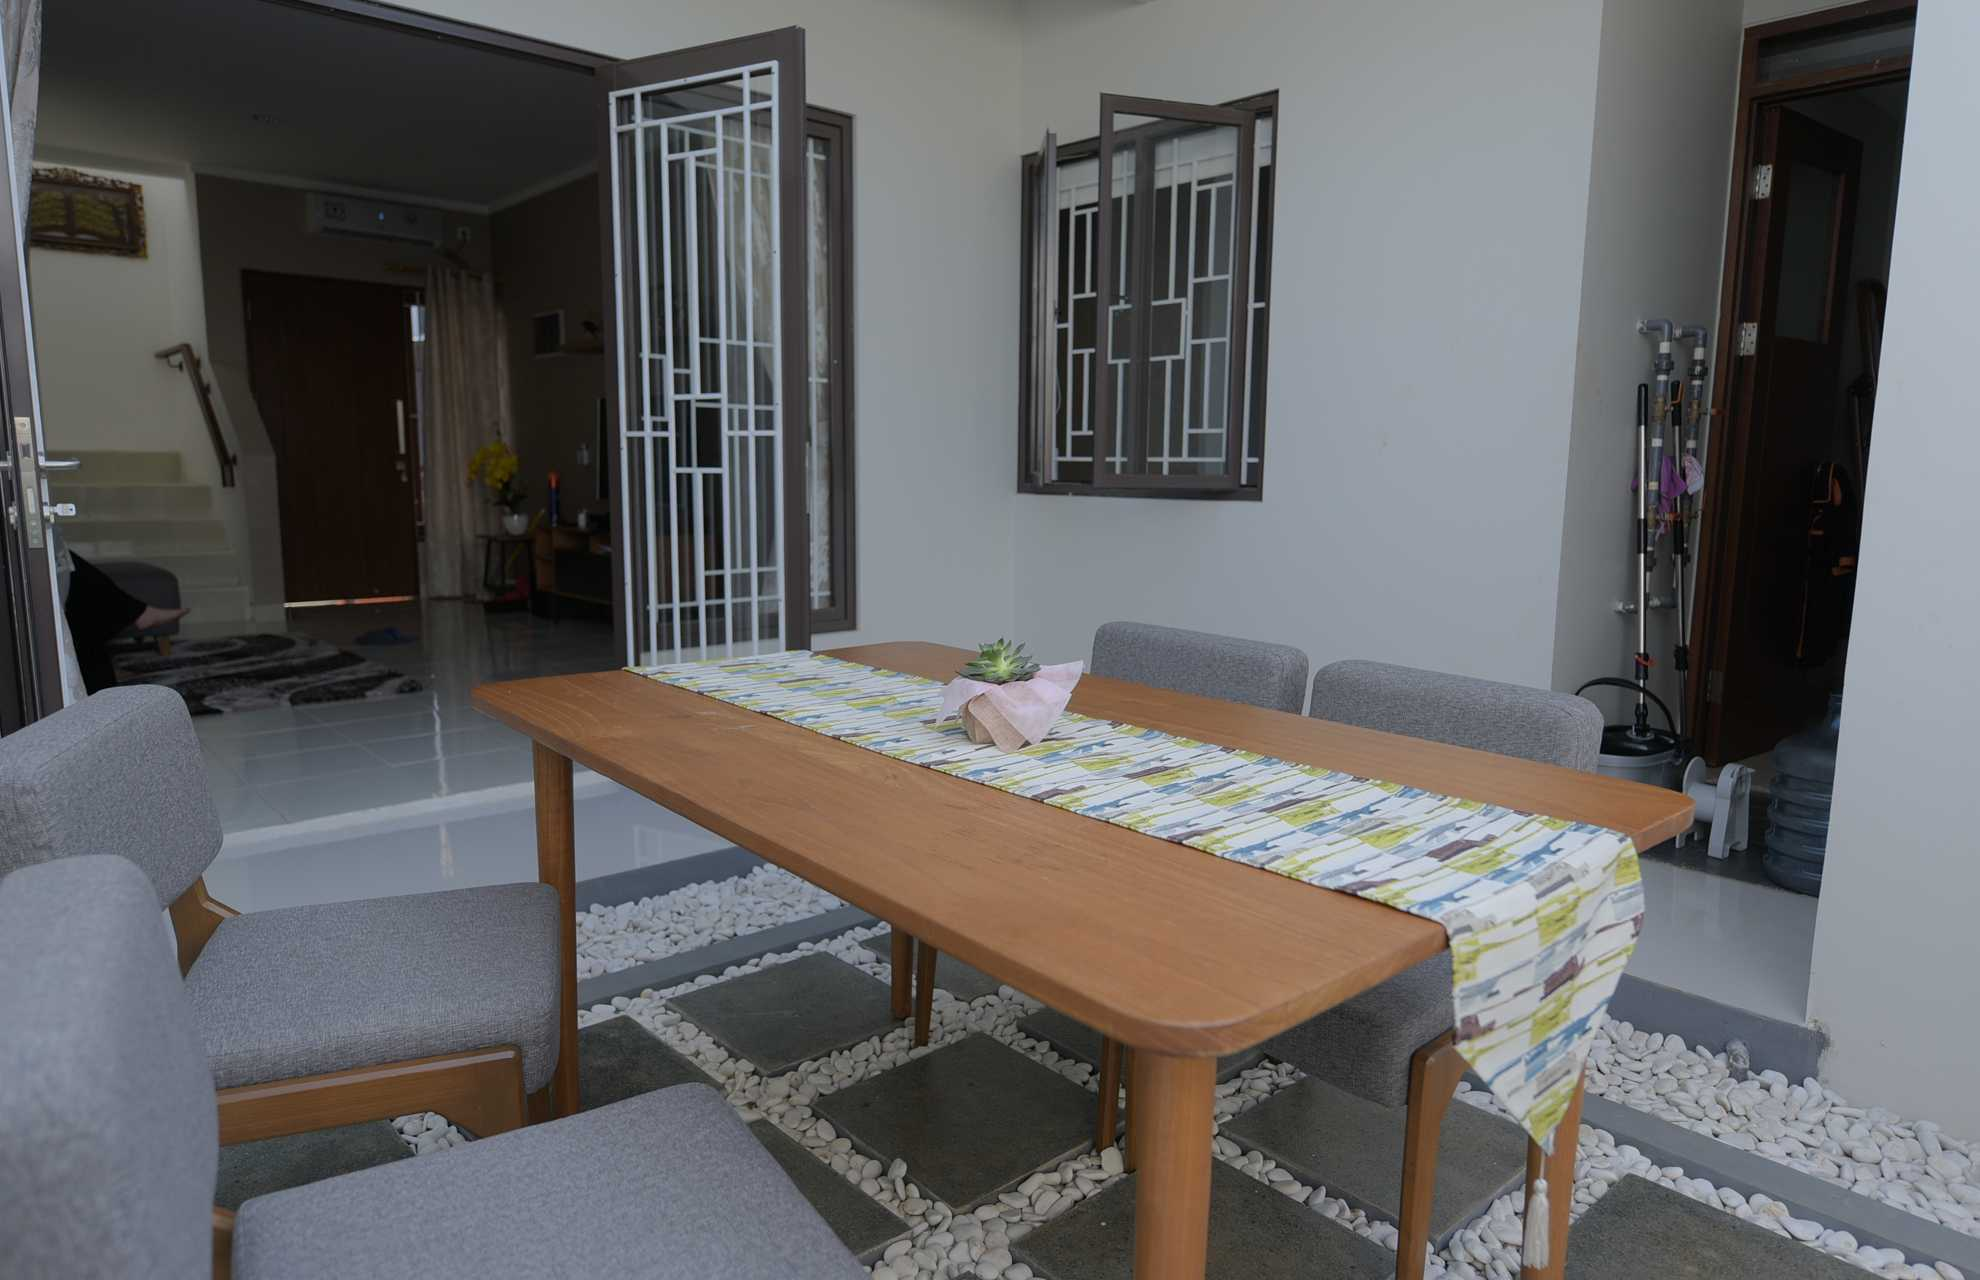 Home By Fabelio.com Premier Terrace Ciracas House Jalan Raya Ciracas, Rt.2/rw.5, Ciracas, Kota Jakarta Timur, Aceh 13740, Indonesia Jalan Raya Ciracas, Rt.2/rw.5, Ciracas, Kota Jakarta Timur, Aceh 13740, Indonesia Dining Room Skandinavia  54126